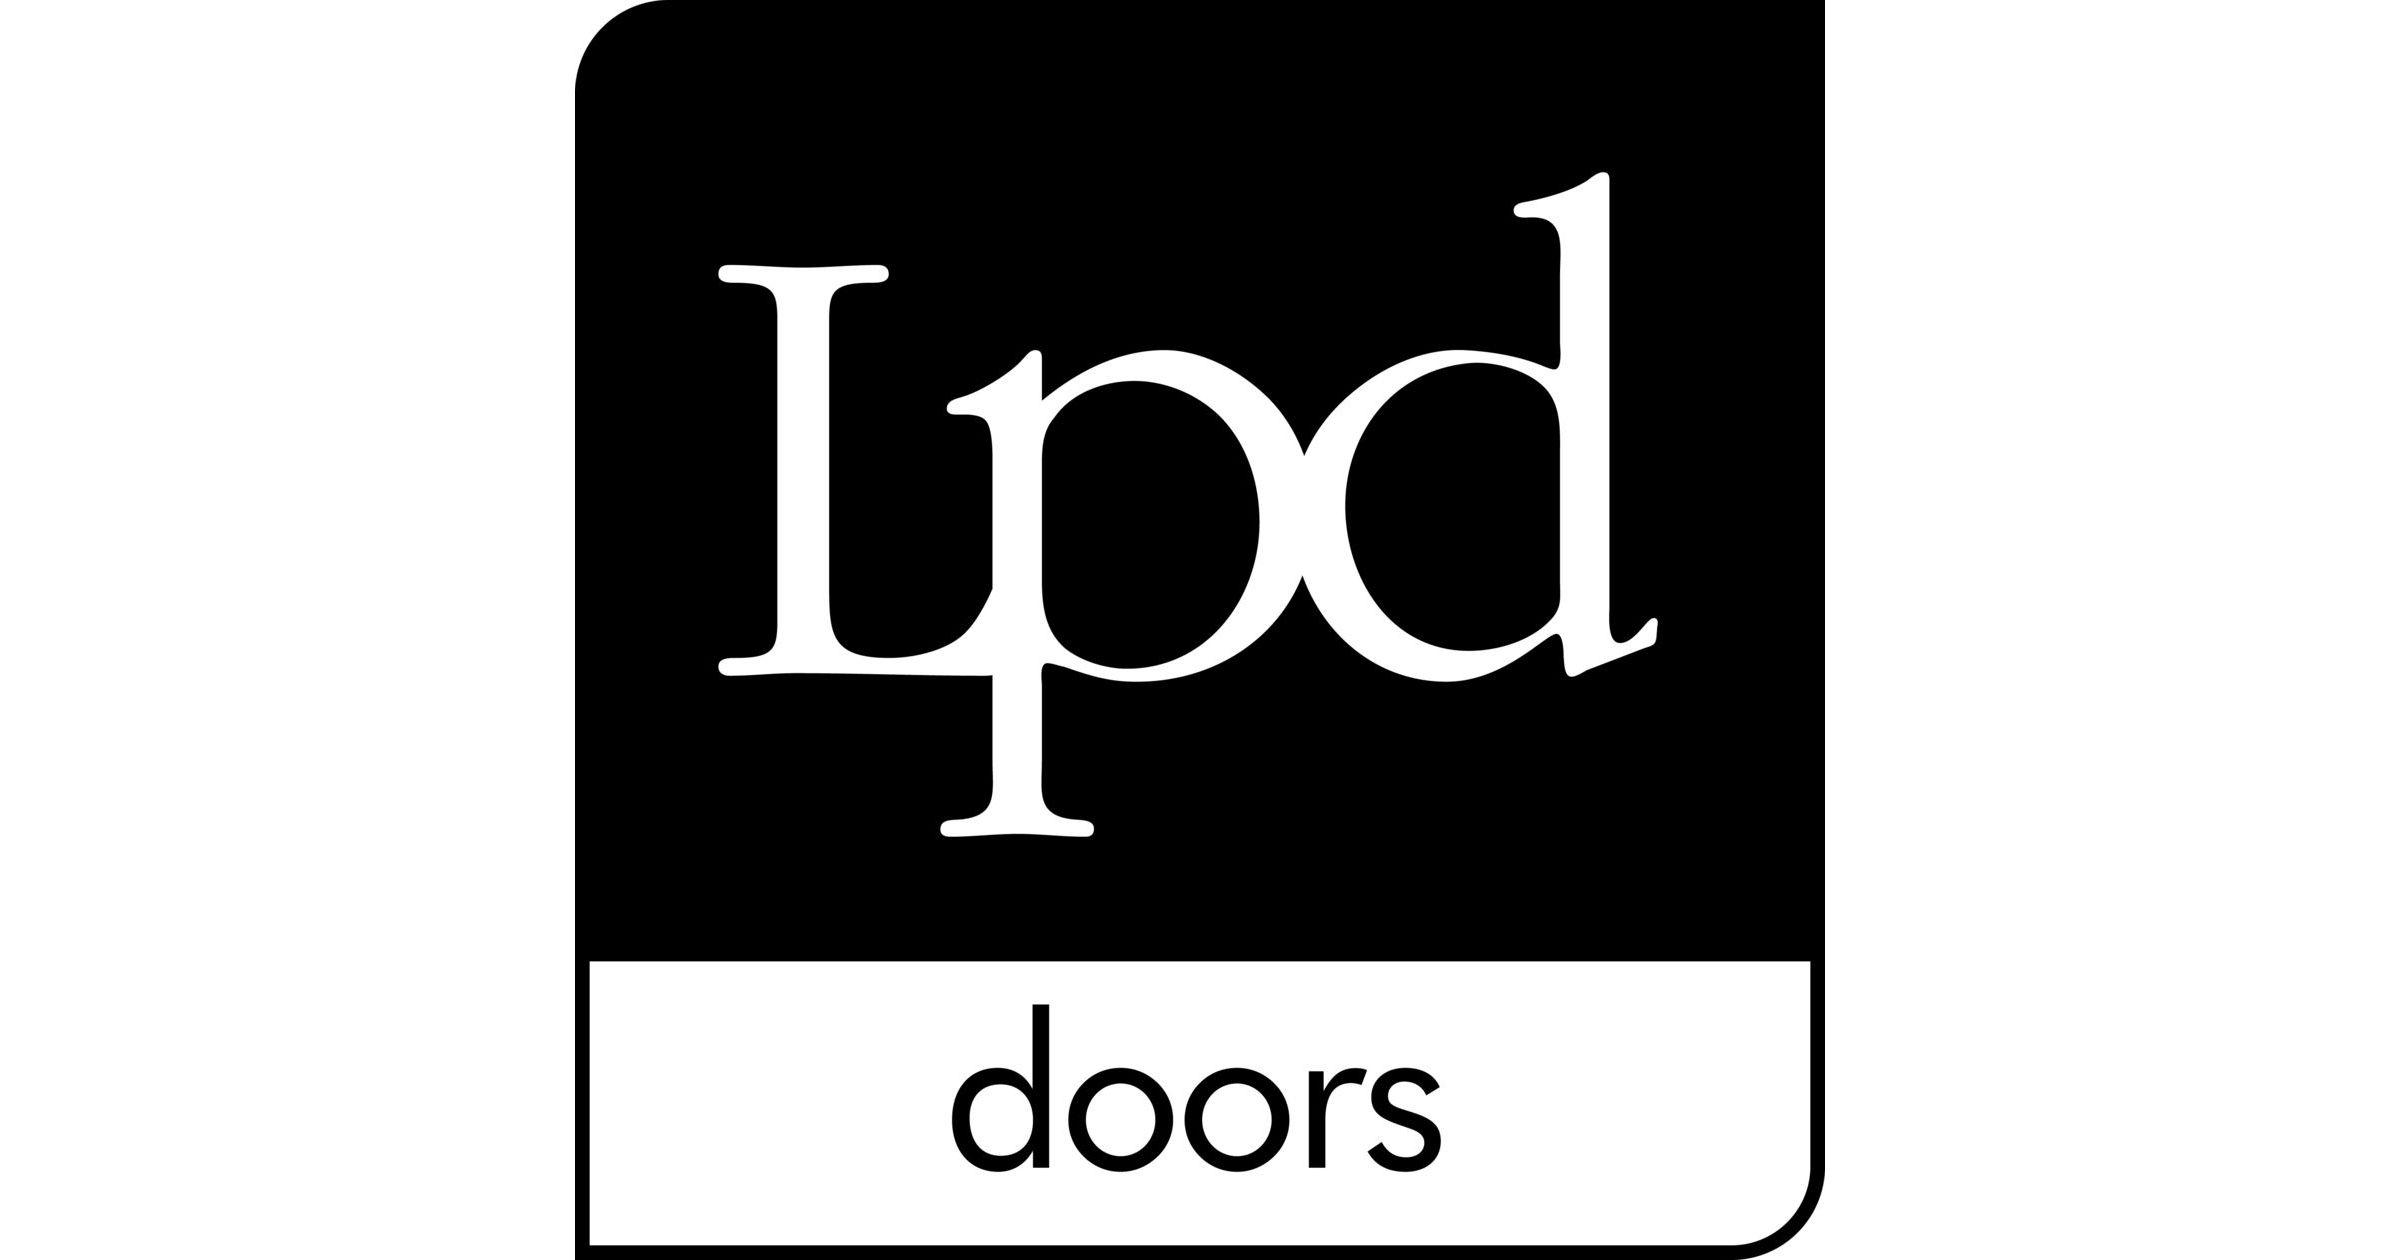 sc 1 st  JAS Timber & LPD FD30 Fire Doors | JAS Timber